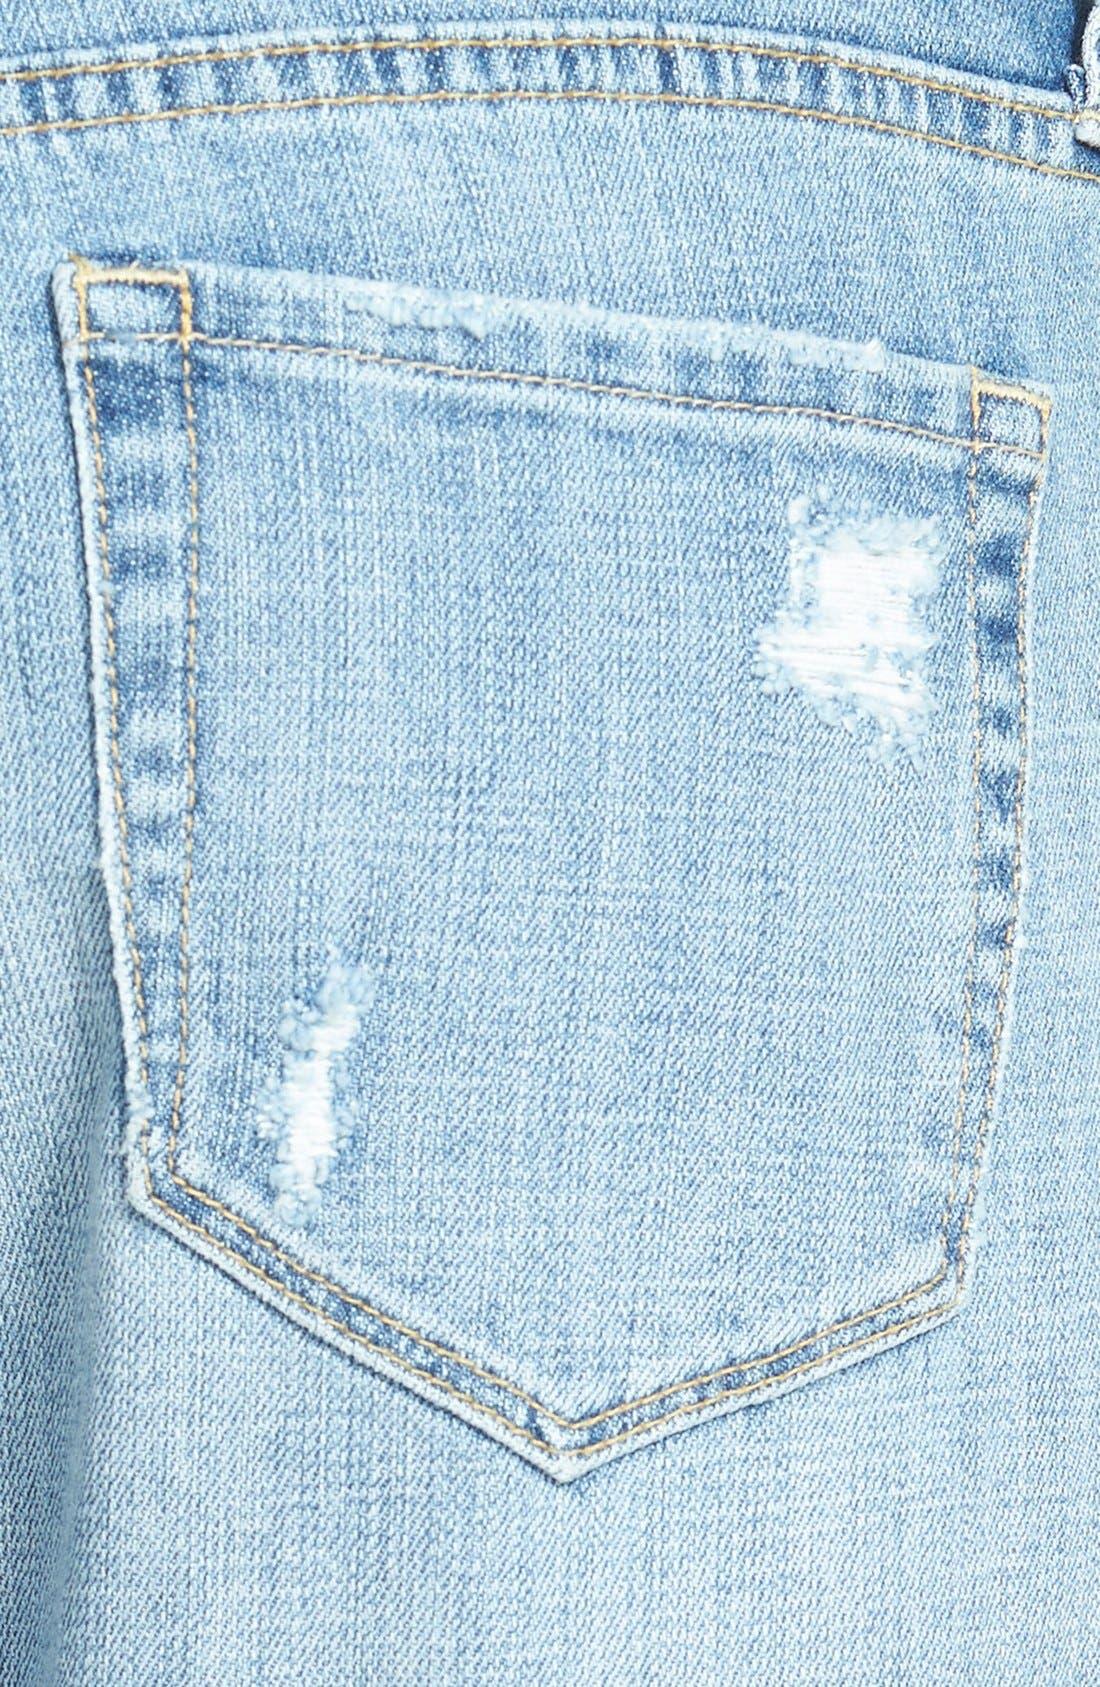 Alternate Image 3  - Treasure&Bond Destructed Boyfriend Jeans (Blue Jay Light Rip & Repair)